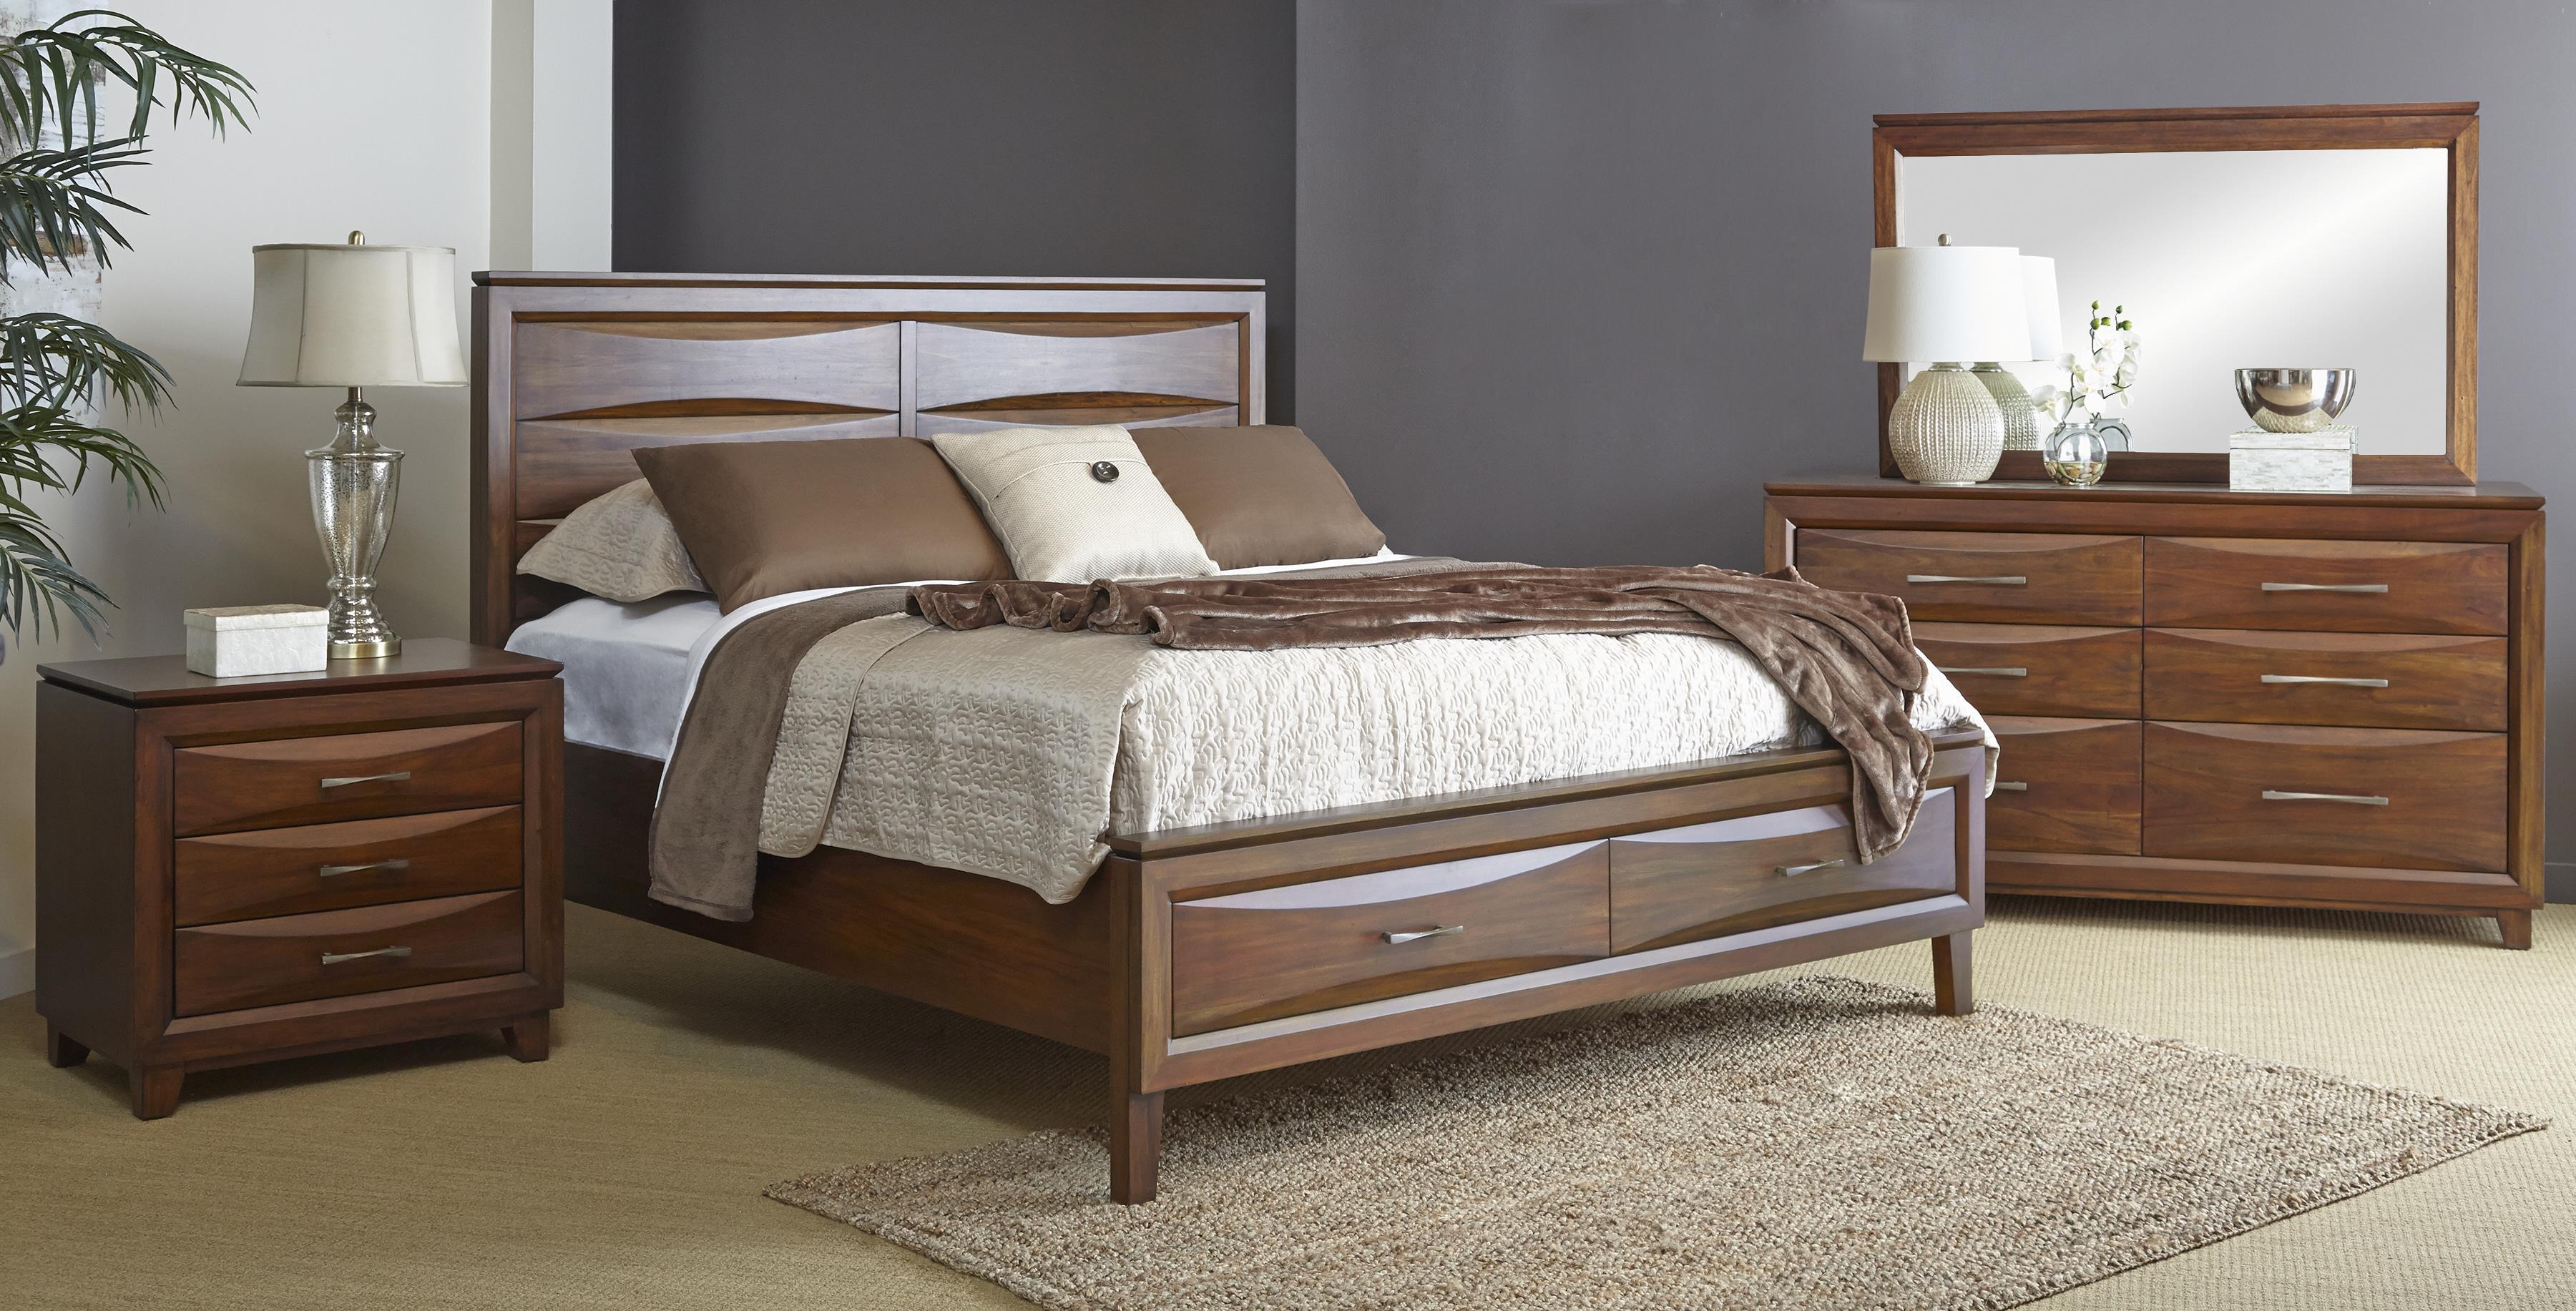 Delicieux Riviera By Napa Furniture Designs